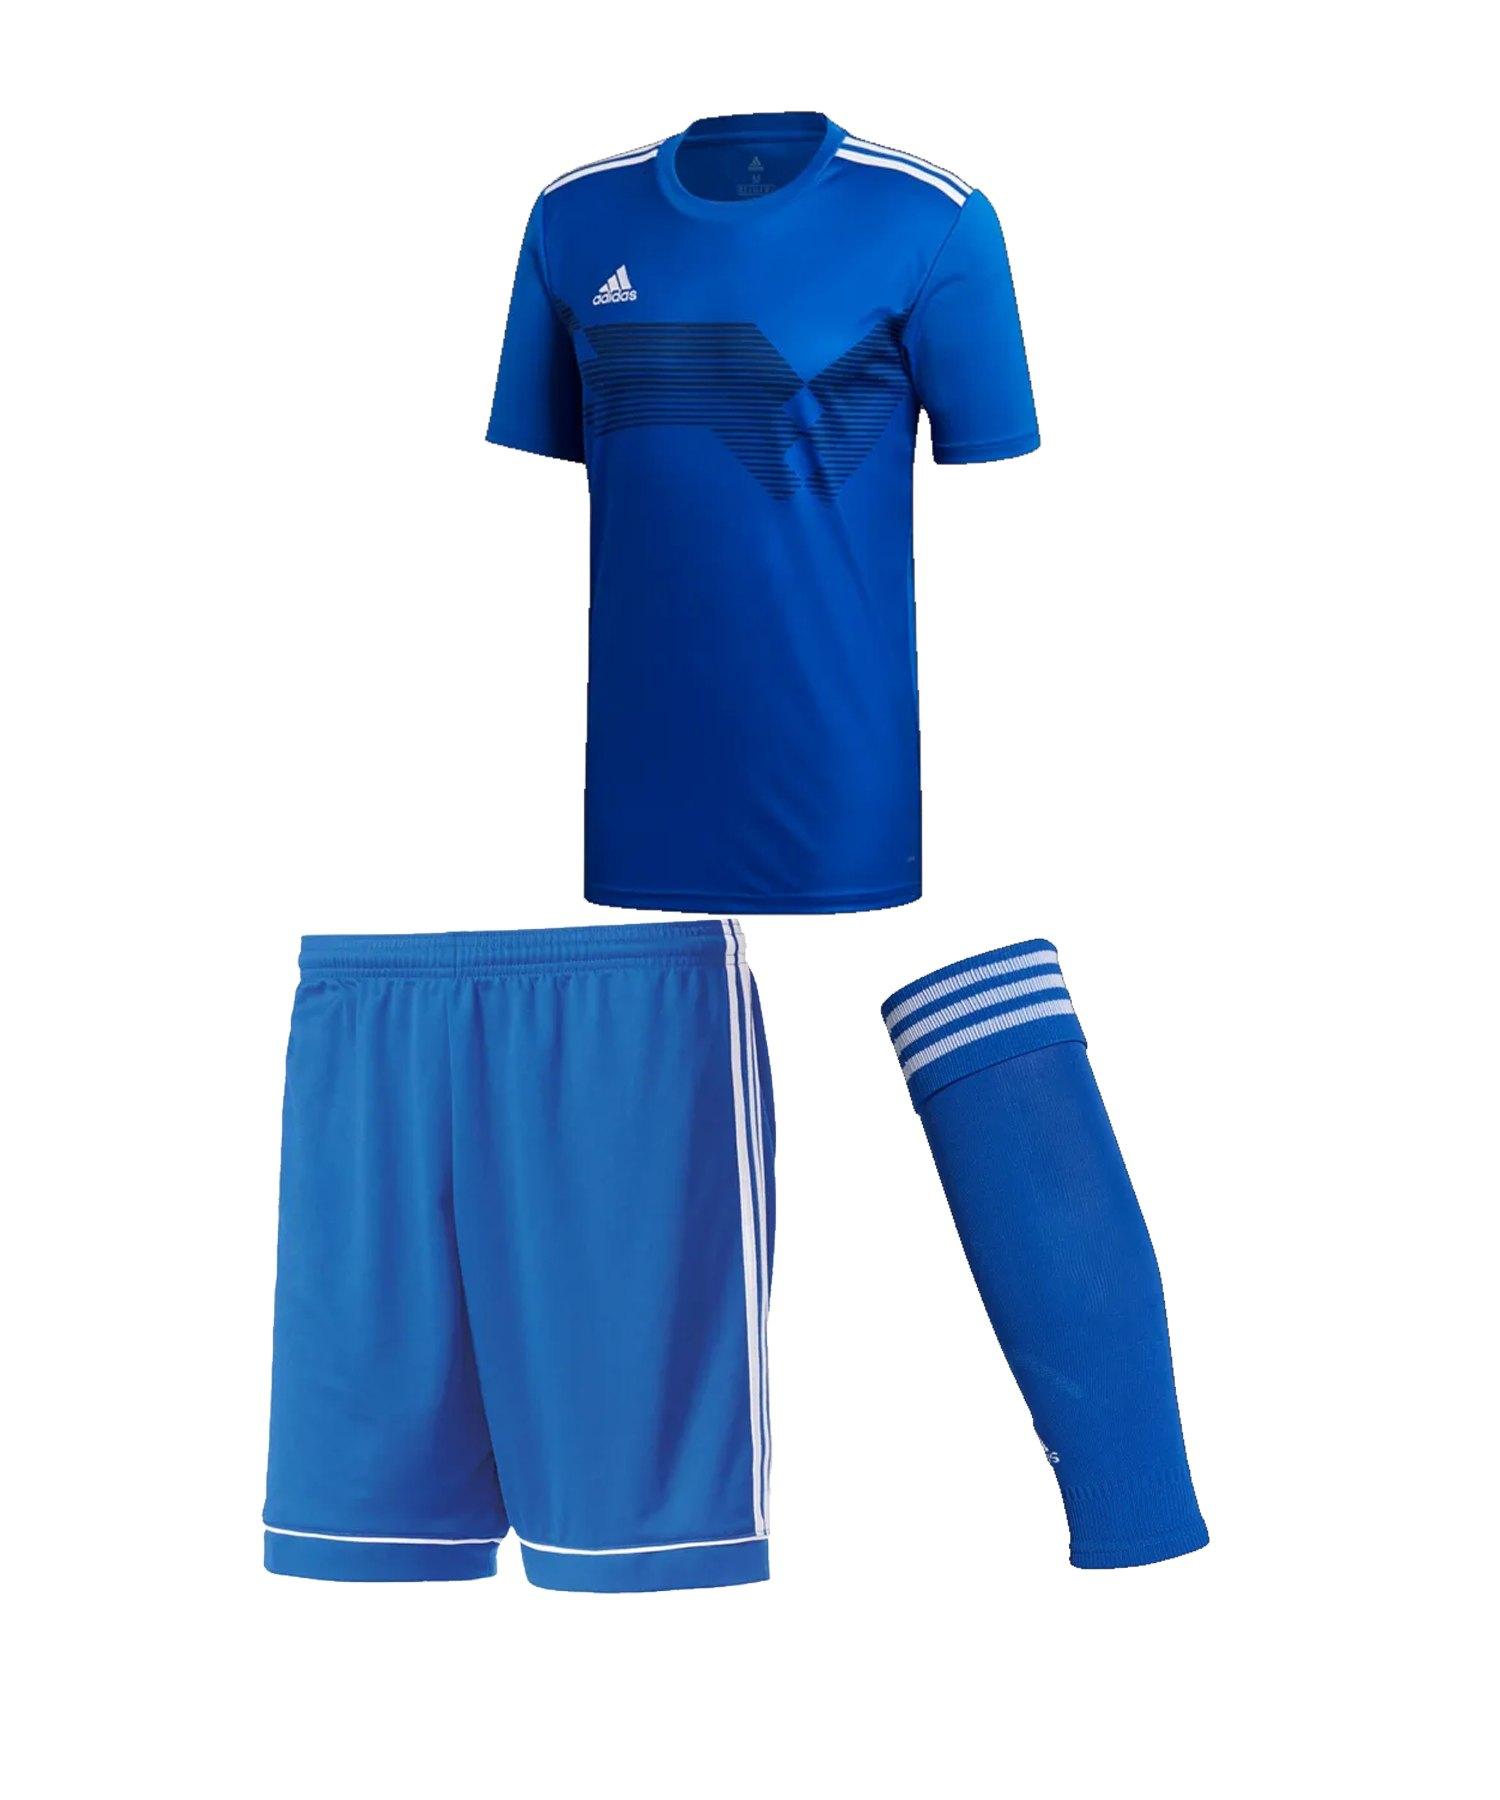 adidas Campeon 19 Trikotset Kids Blau Weiss - blau